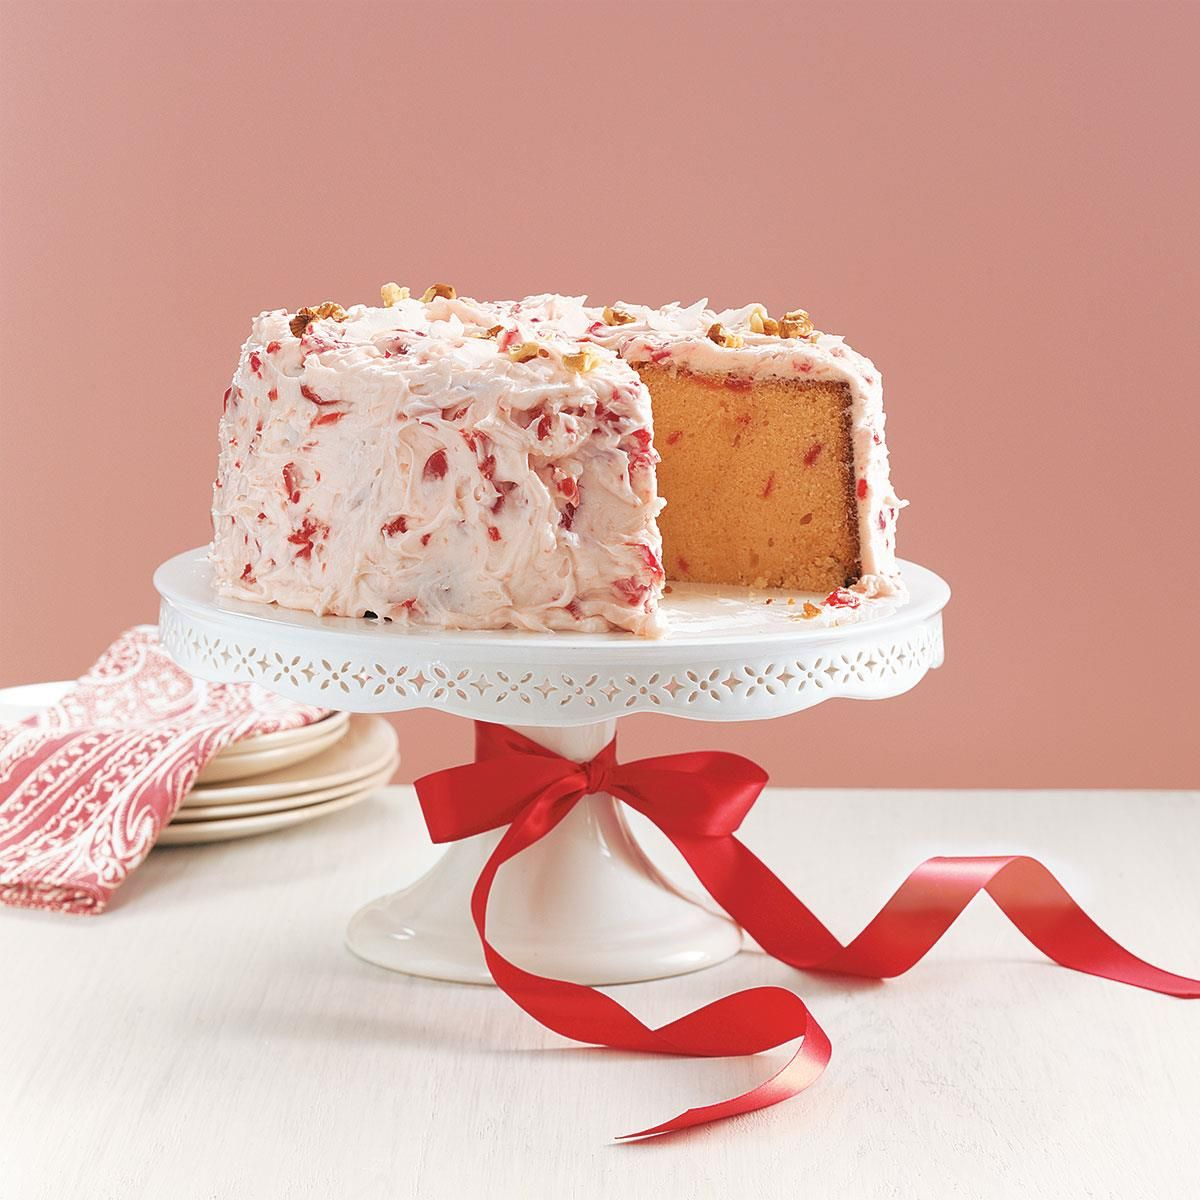 Cherry pound cake recipe pound cake recipes cake